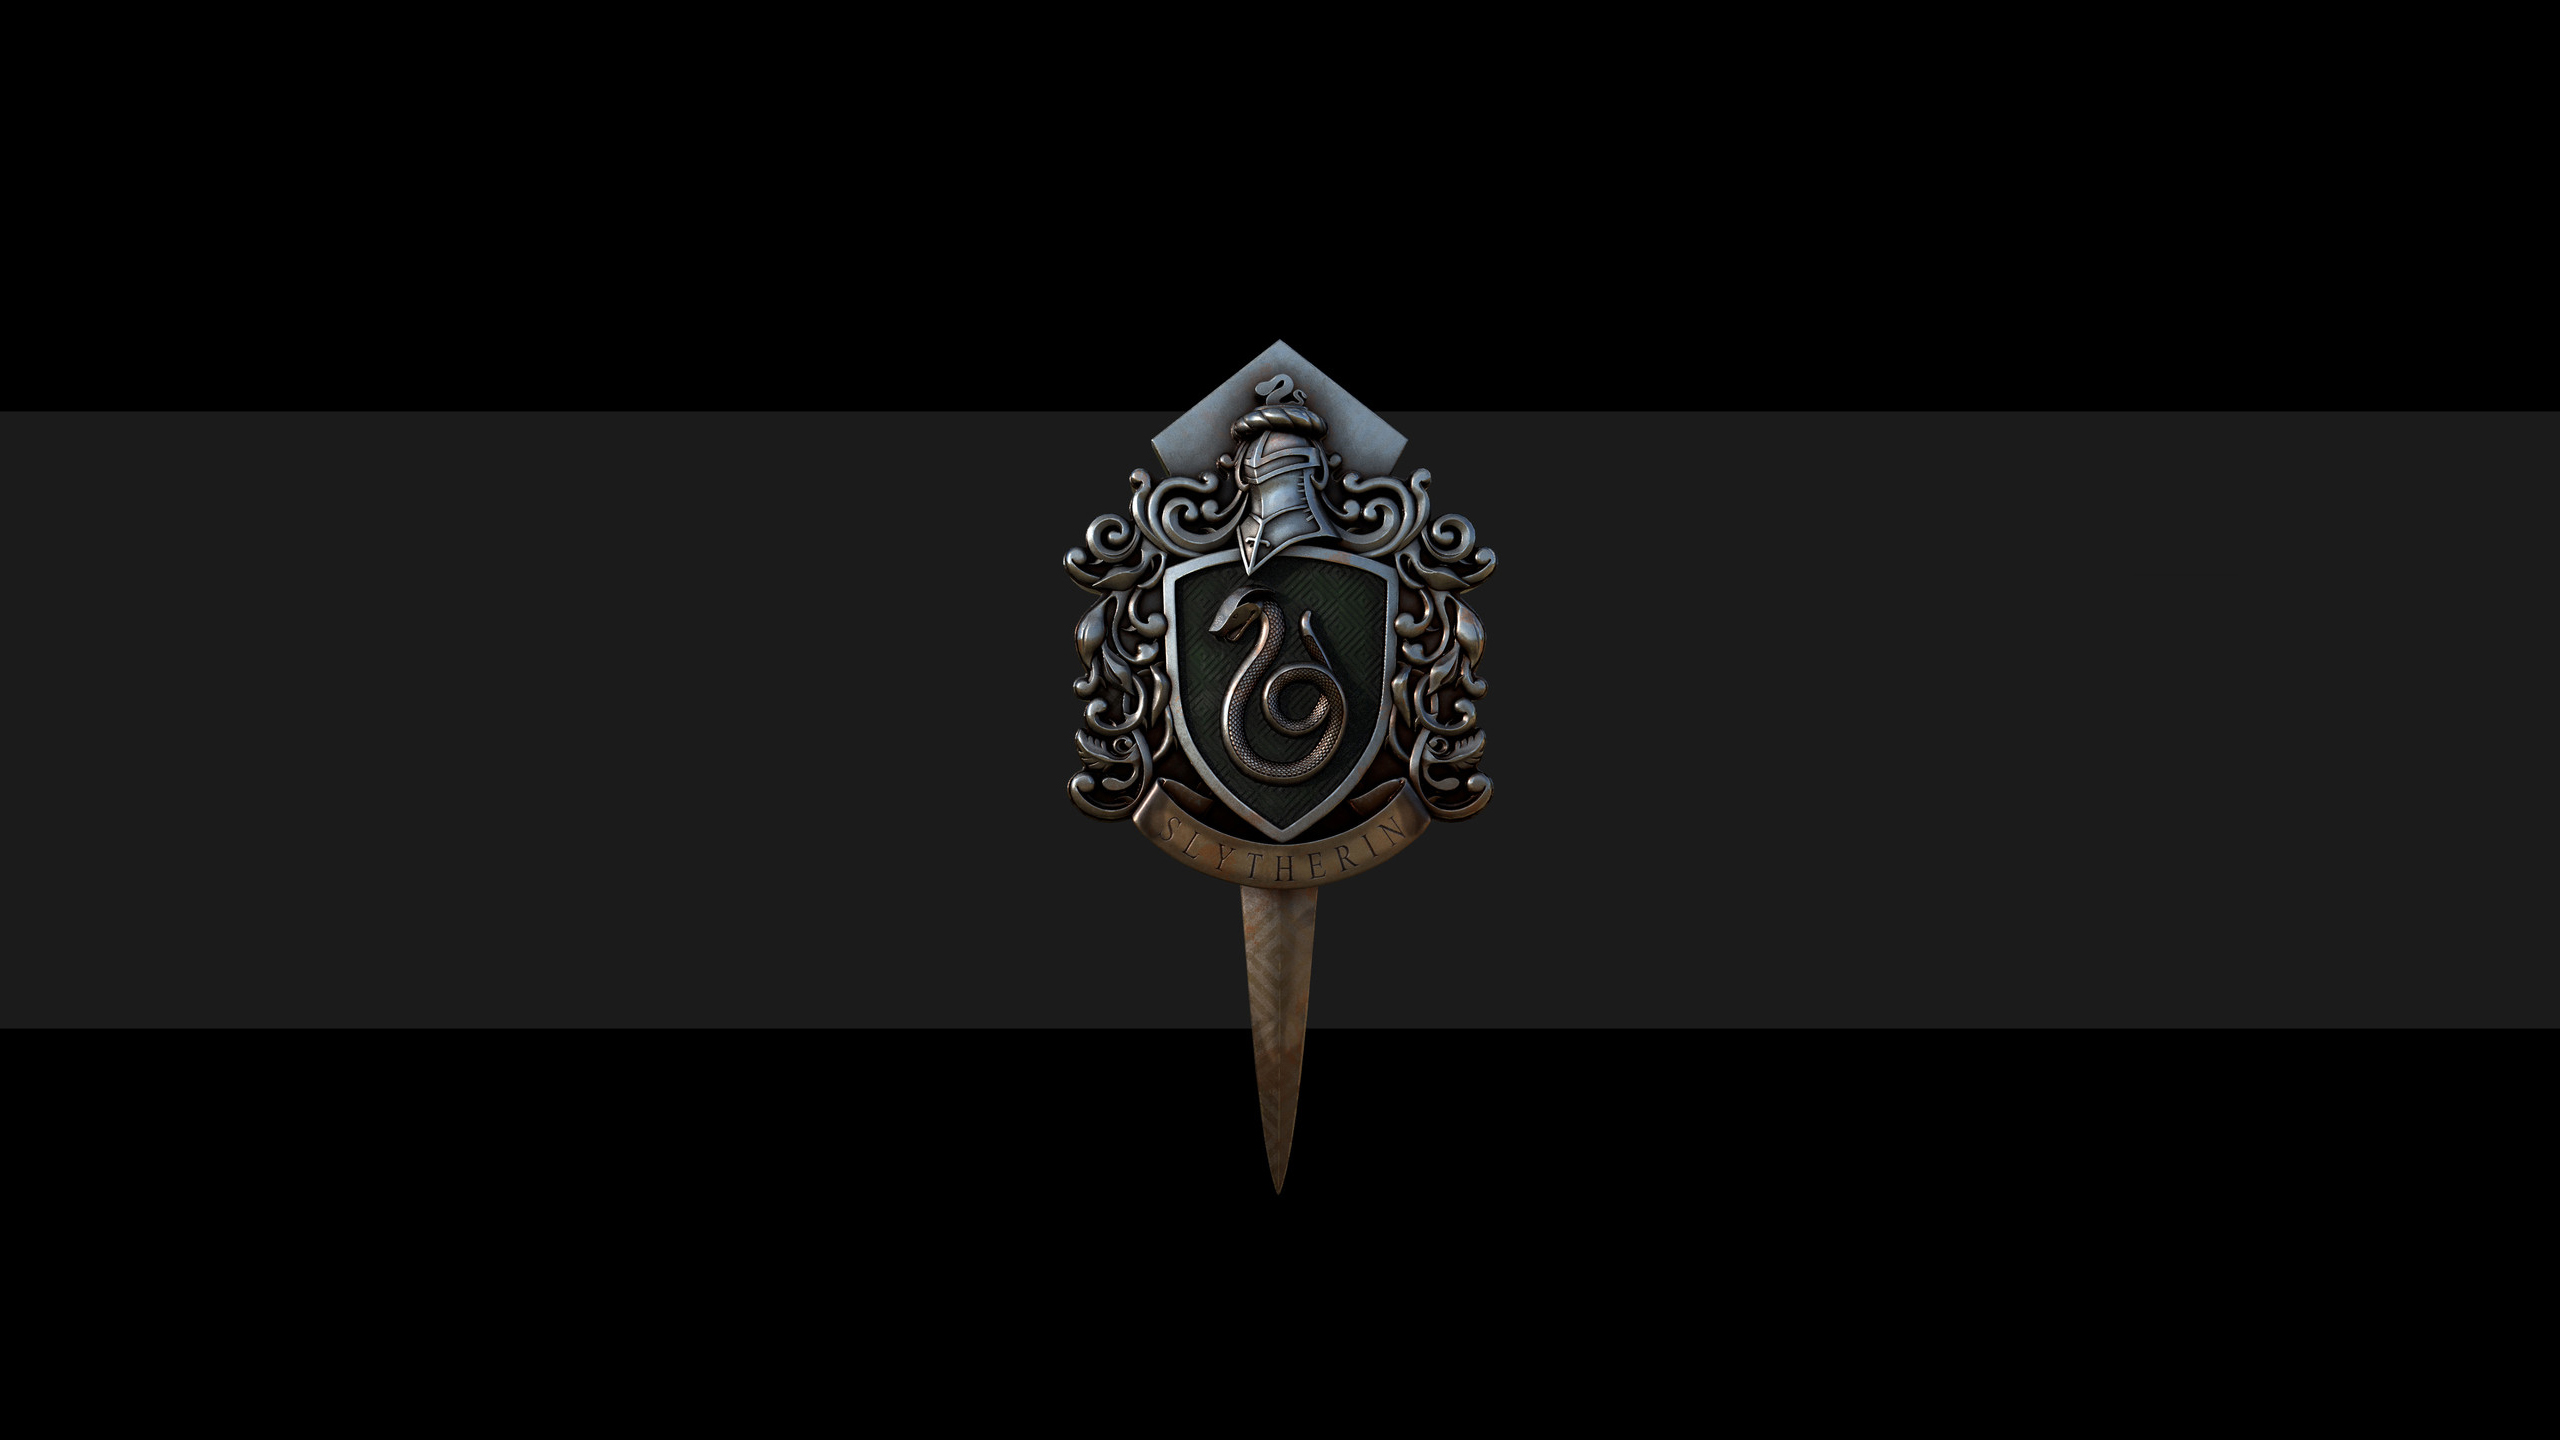 Wallpaper Slytherin Badge Harry Potter